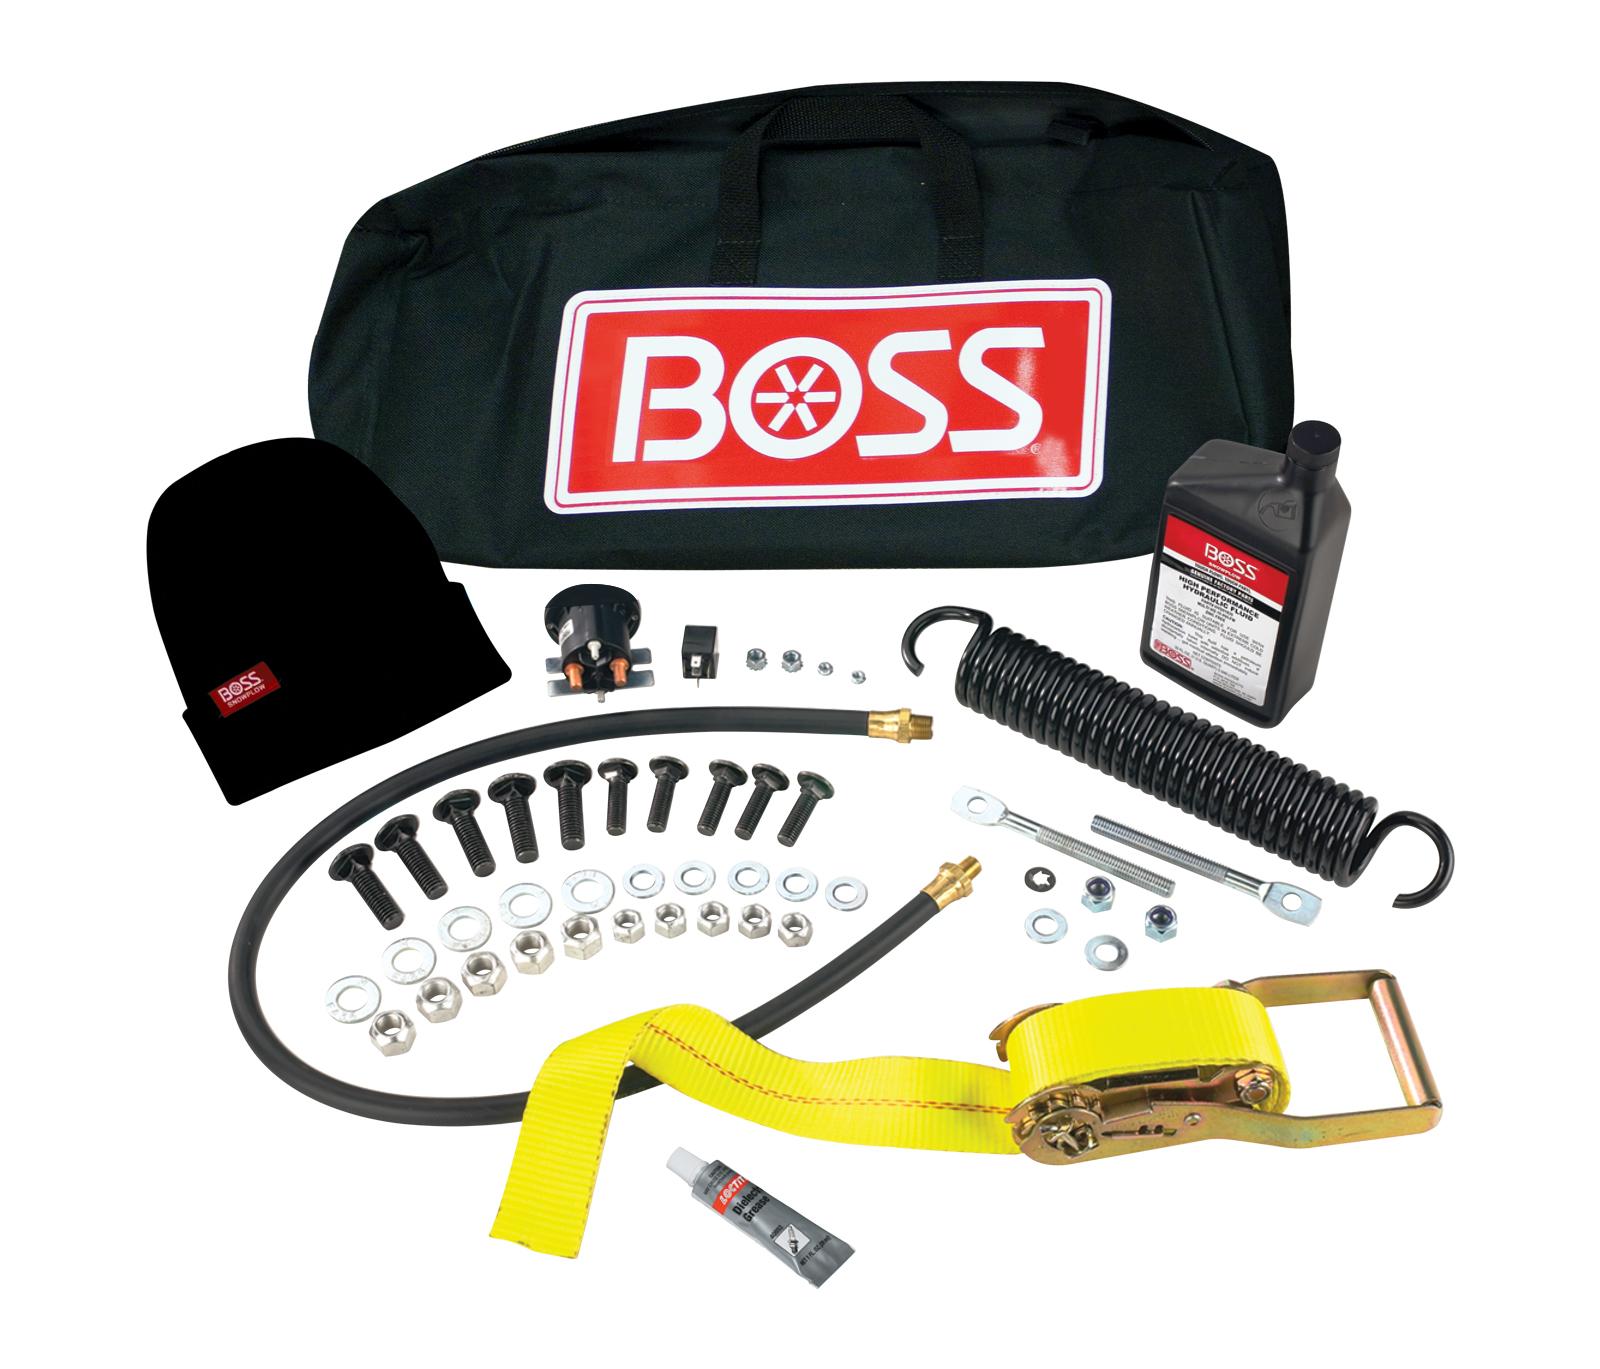 Emergany Parts Kit